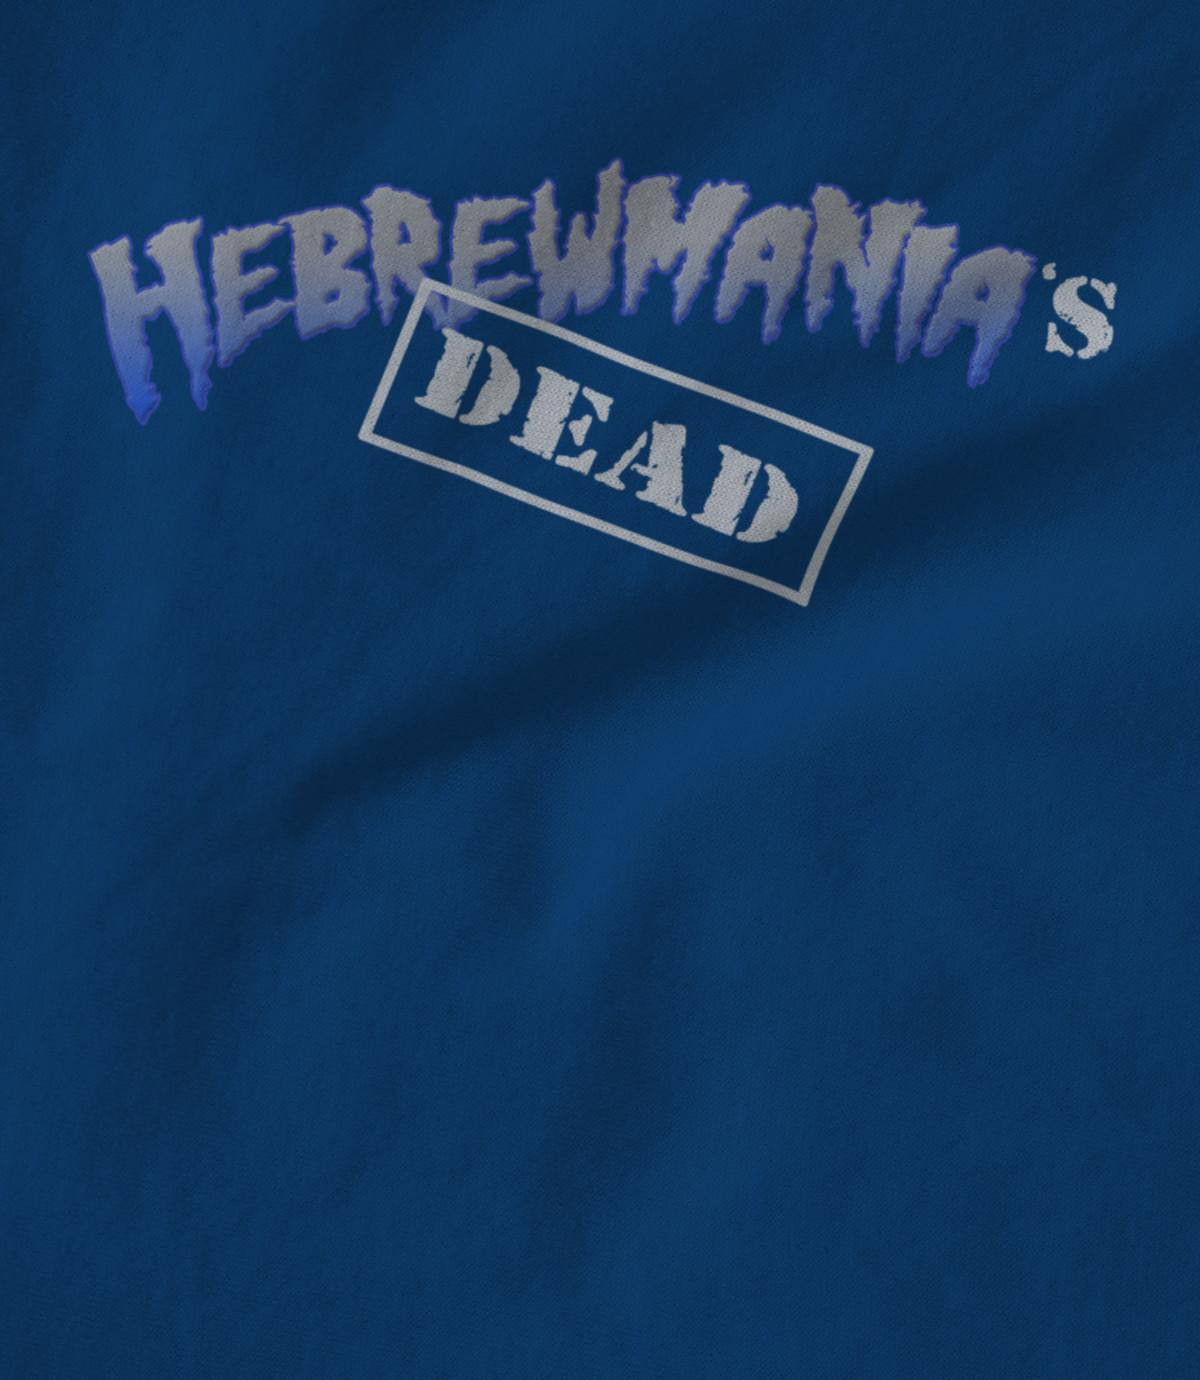 Herschel ben levi hewbrewmania s dead 1489363767